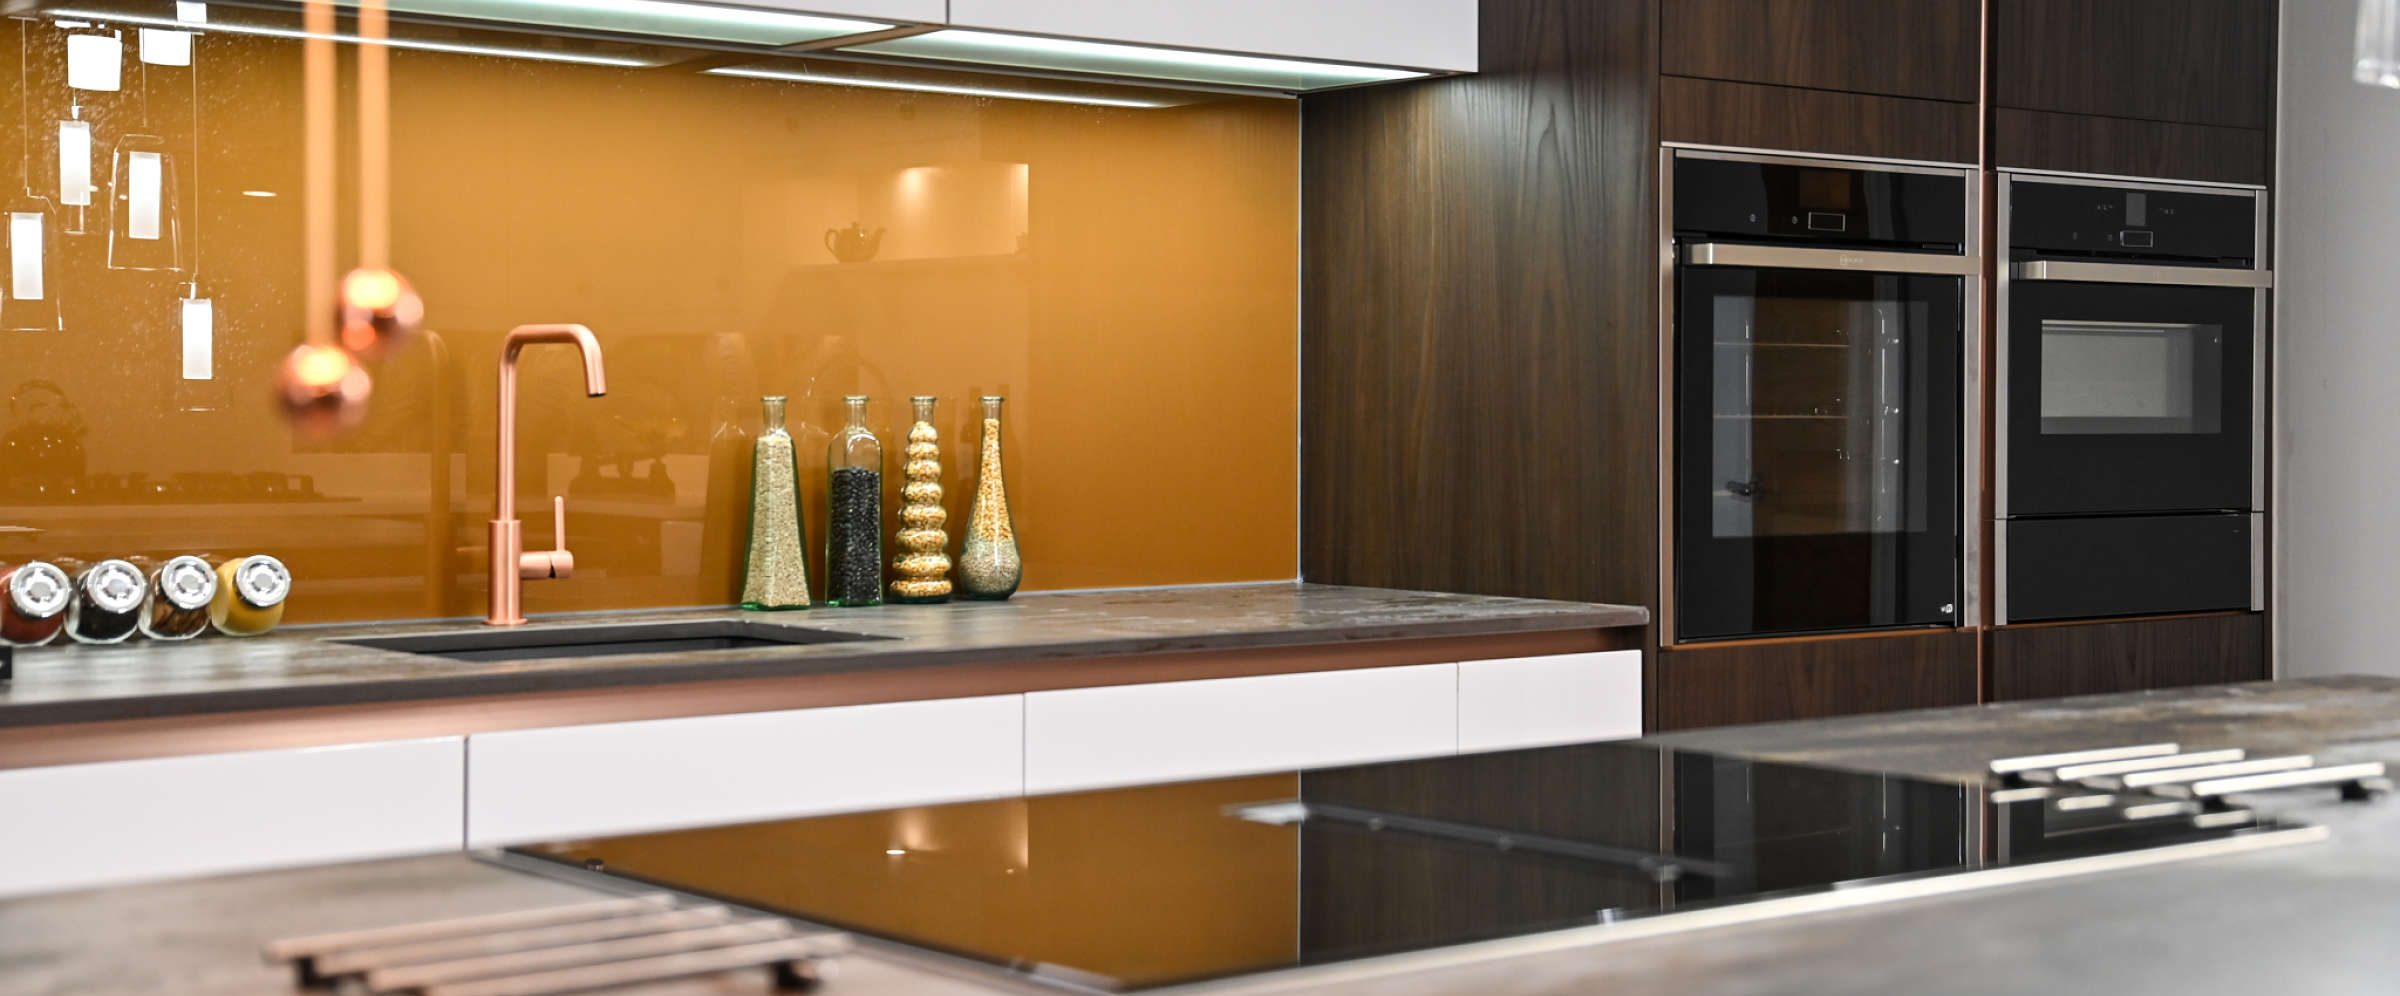 A Gallery kitchen in the Janus Interiors kitchen showroom in Bingley